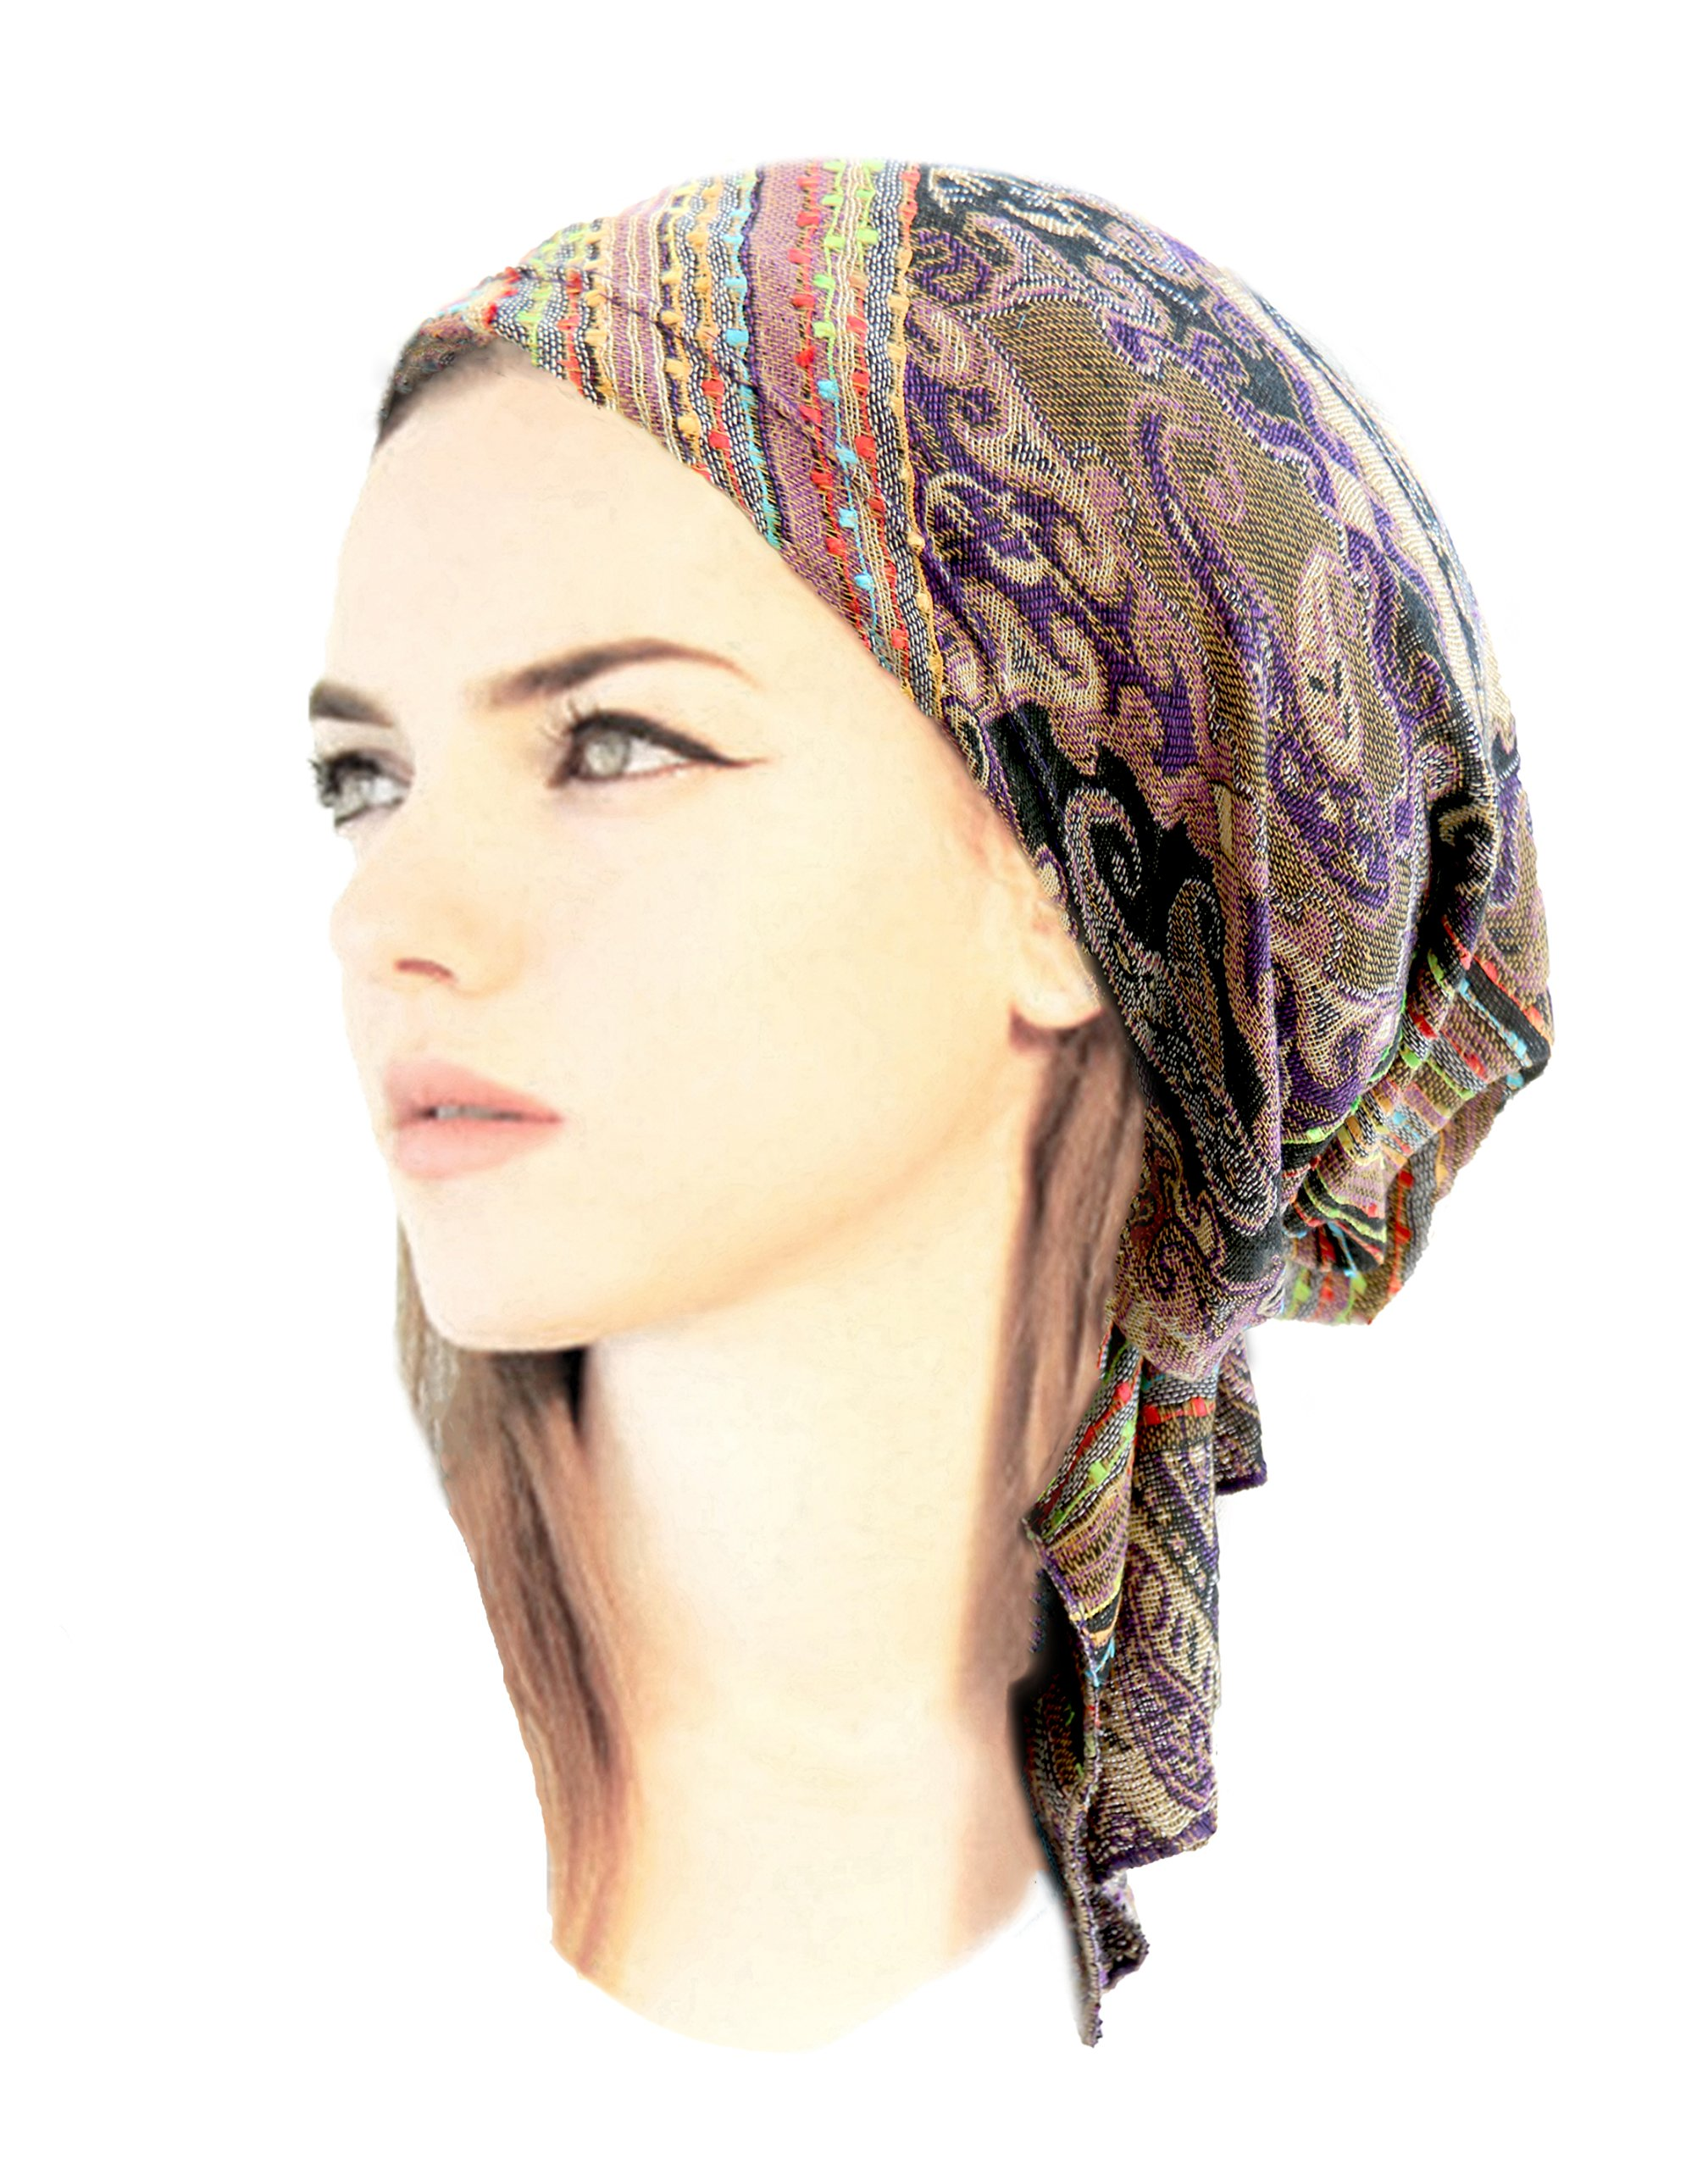 ShariRose Boho Chic Pre-Tied Headwear Versatile Ties Cool Knit Pashima Ethnic Print Collection (Purple - Short)